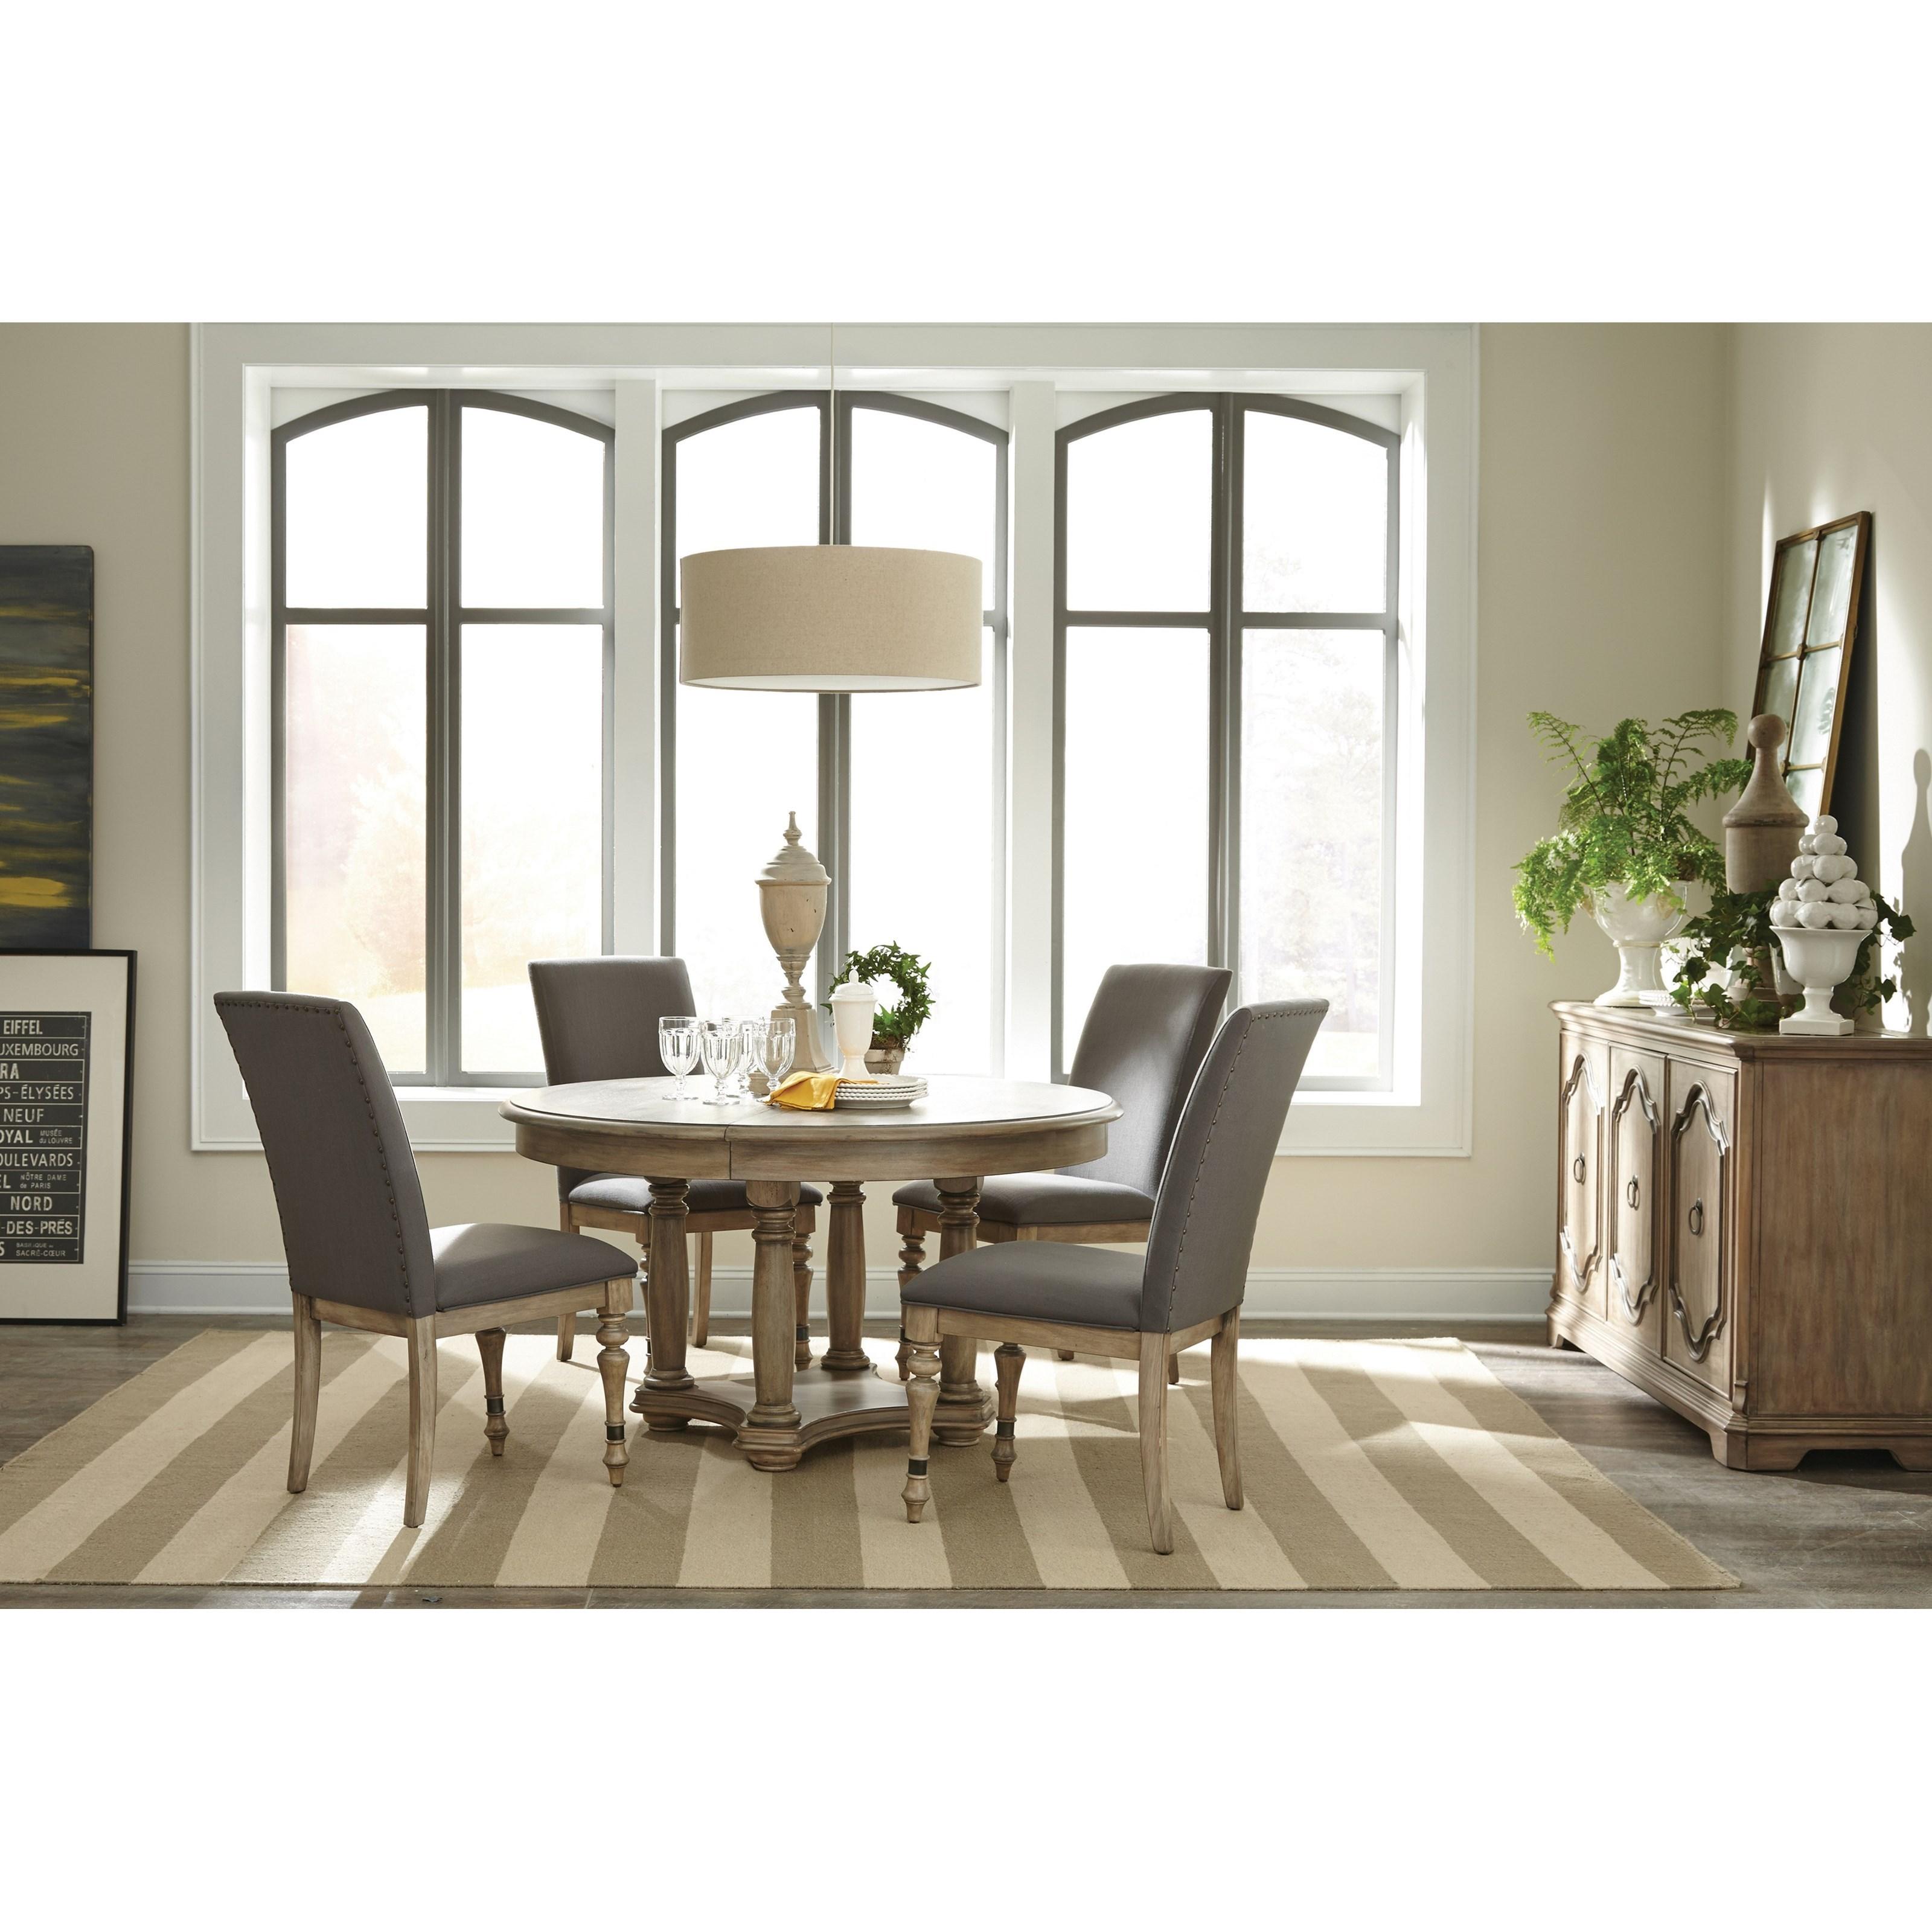 4x4 Dining Table Room Ideas